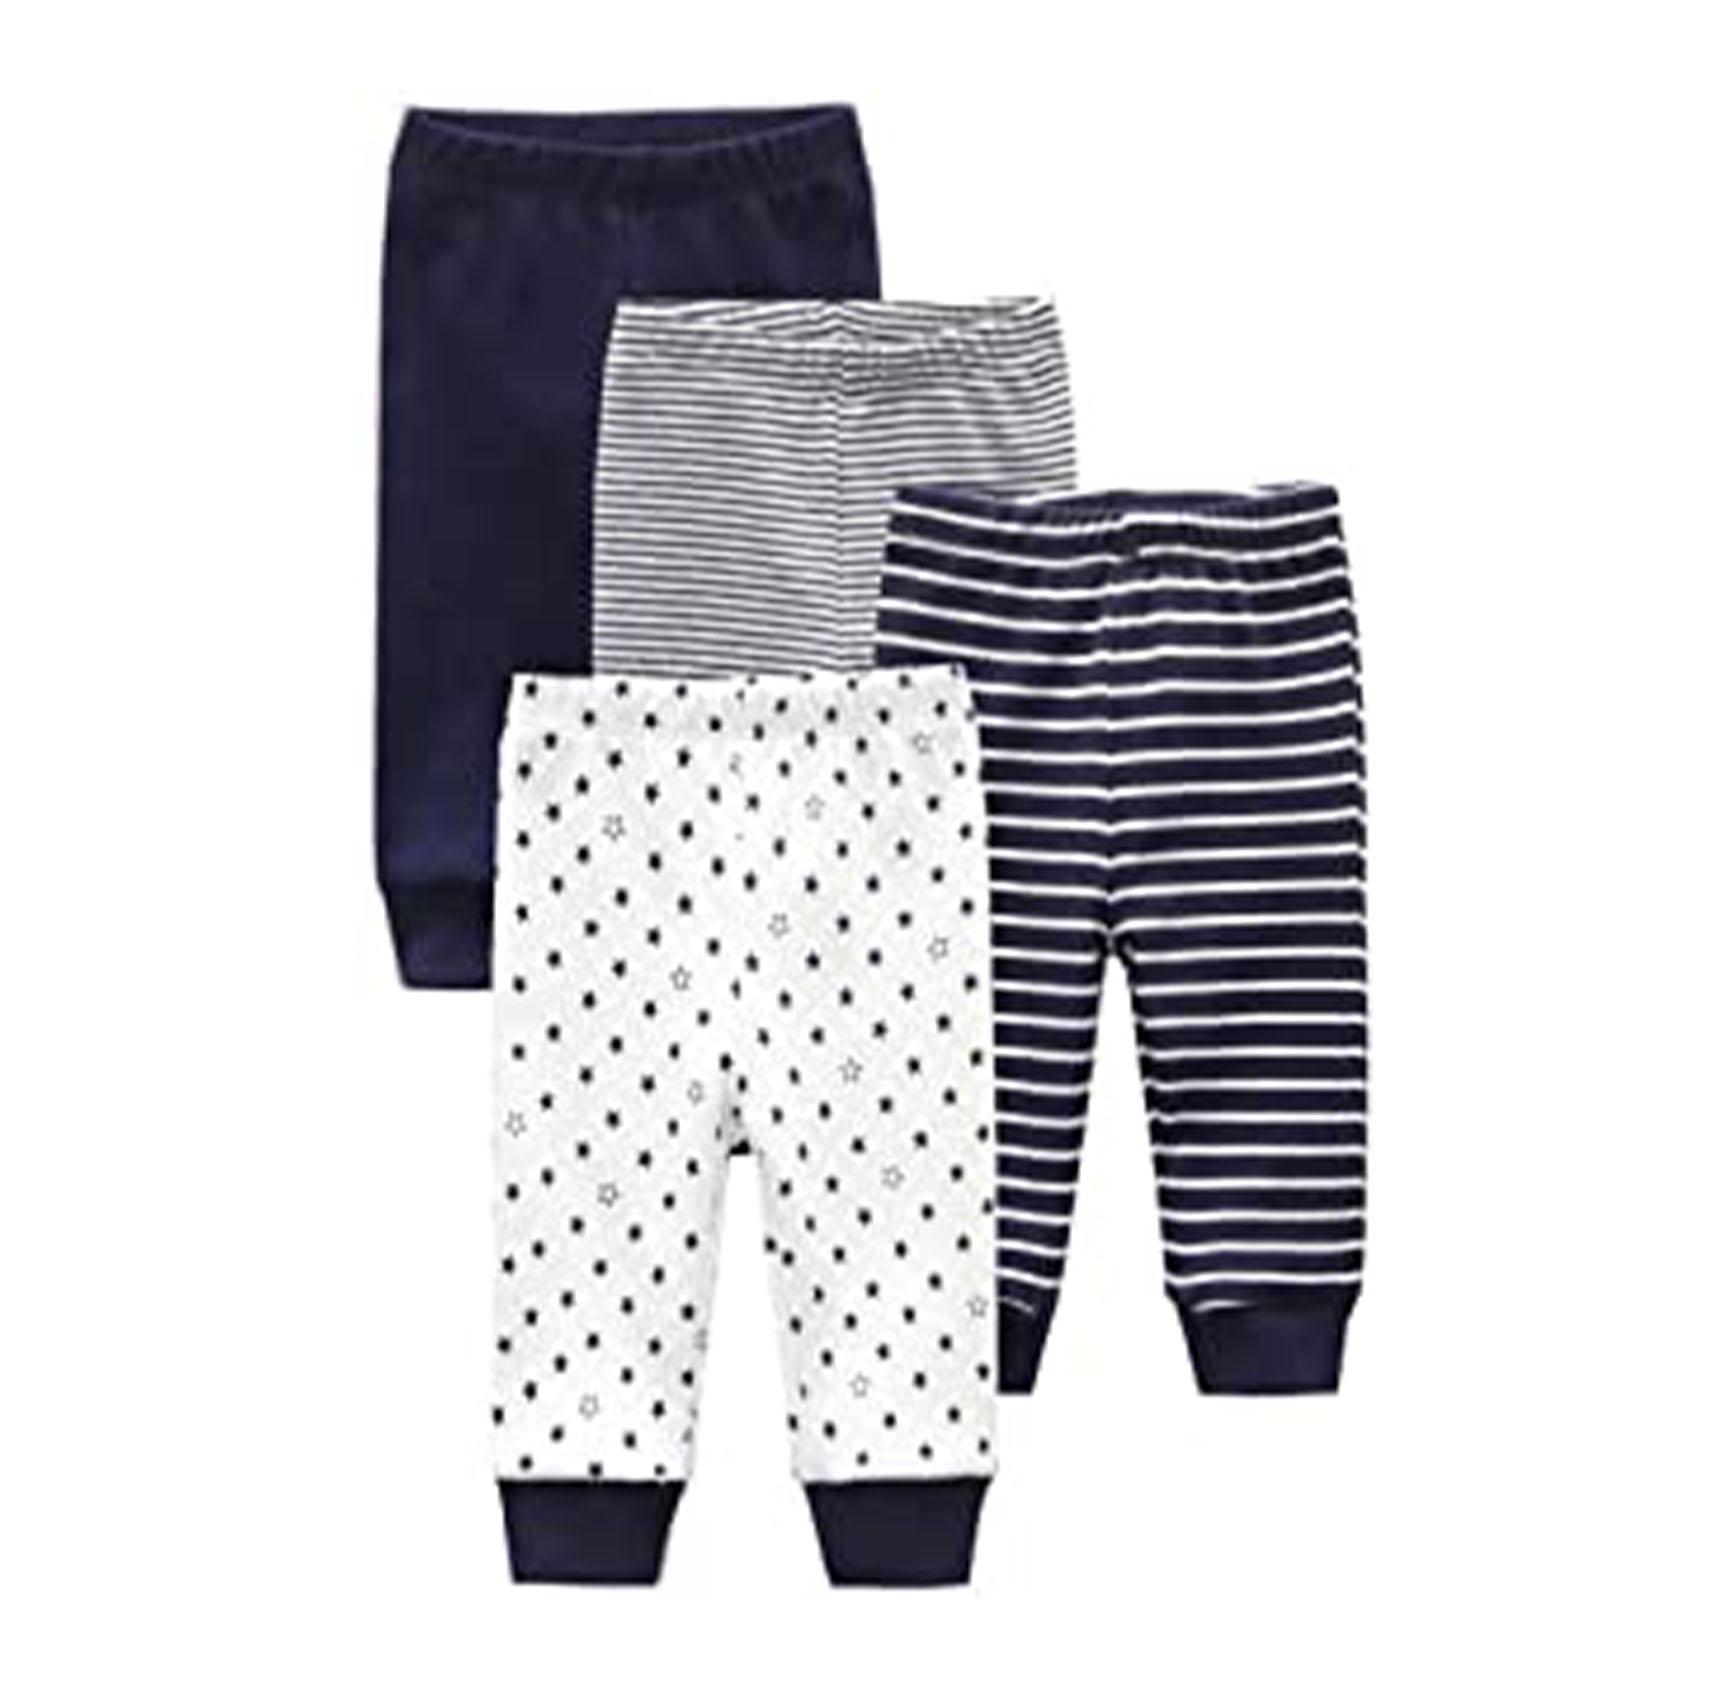 Patterned Gordini Toddlers Wrap Around Gloves /& Knit Cap Bundle